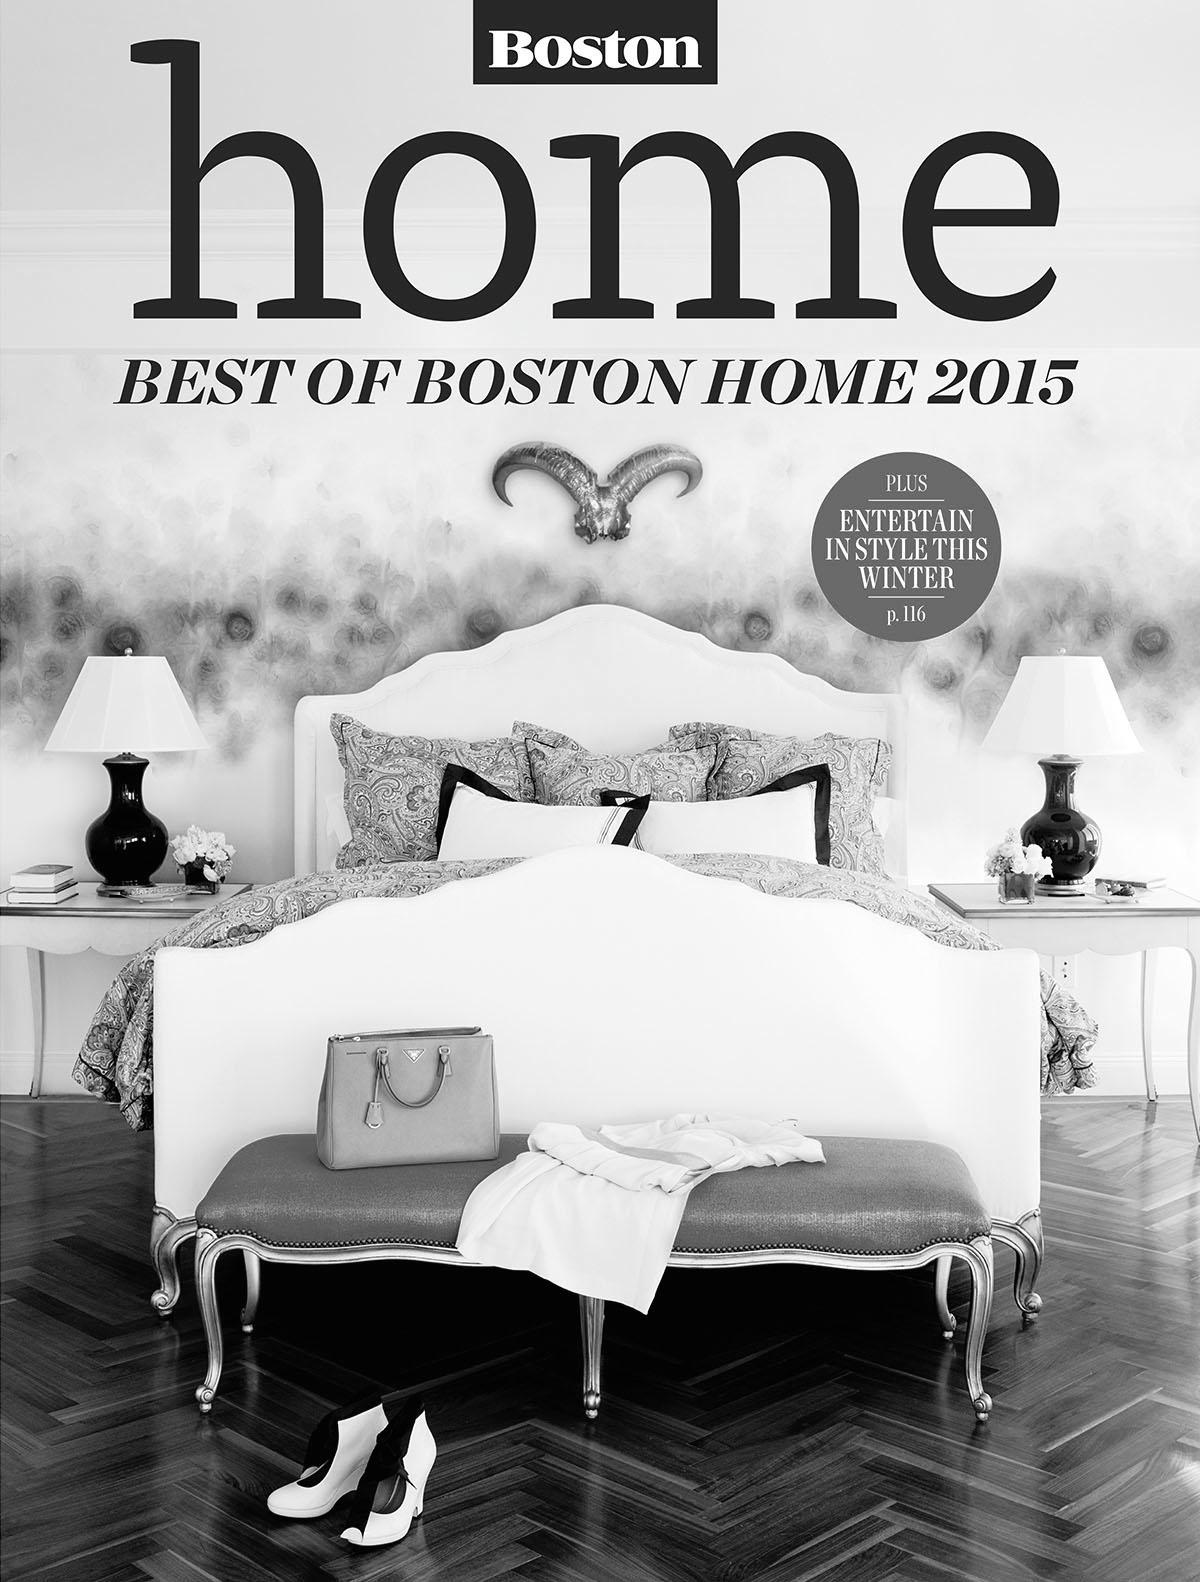 Boston Home Winter 2015 - Best of.jpeg